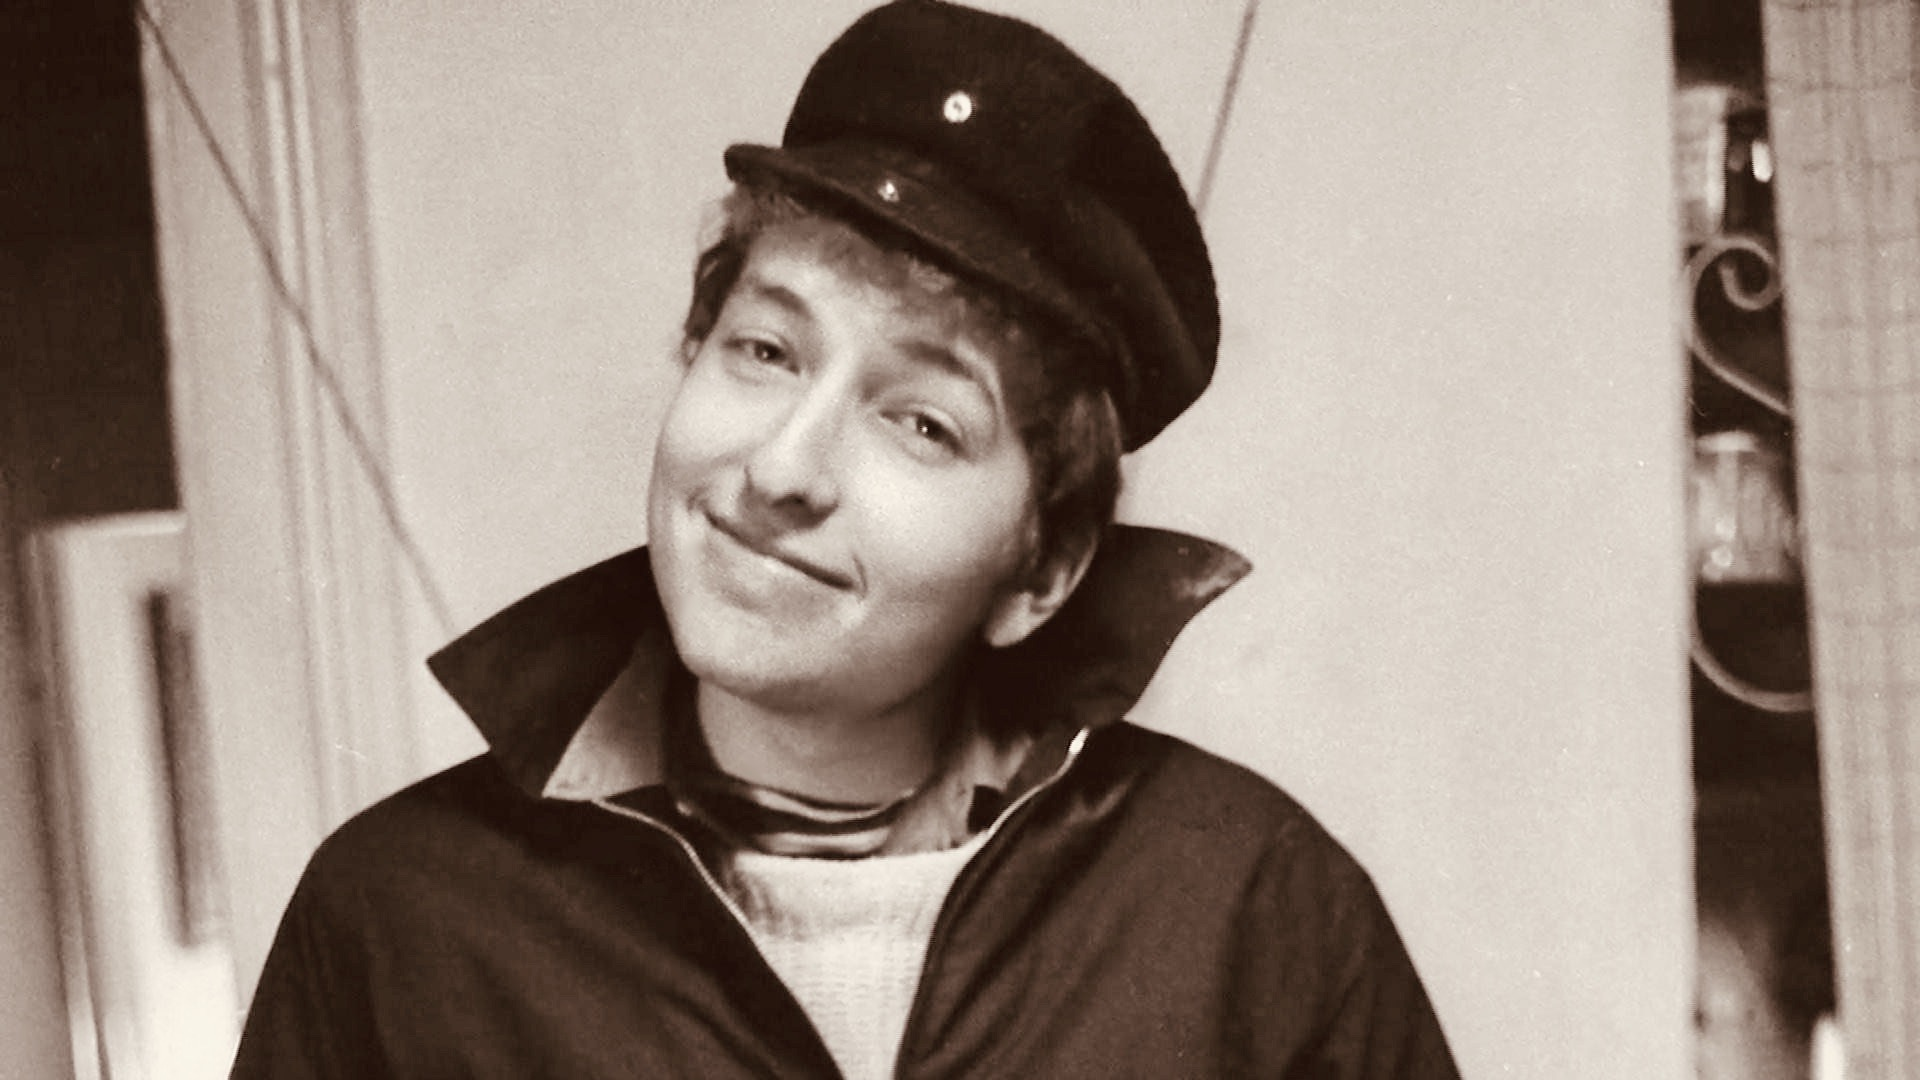 Young Bob Dylan.